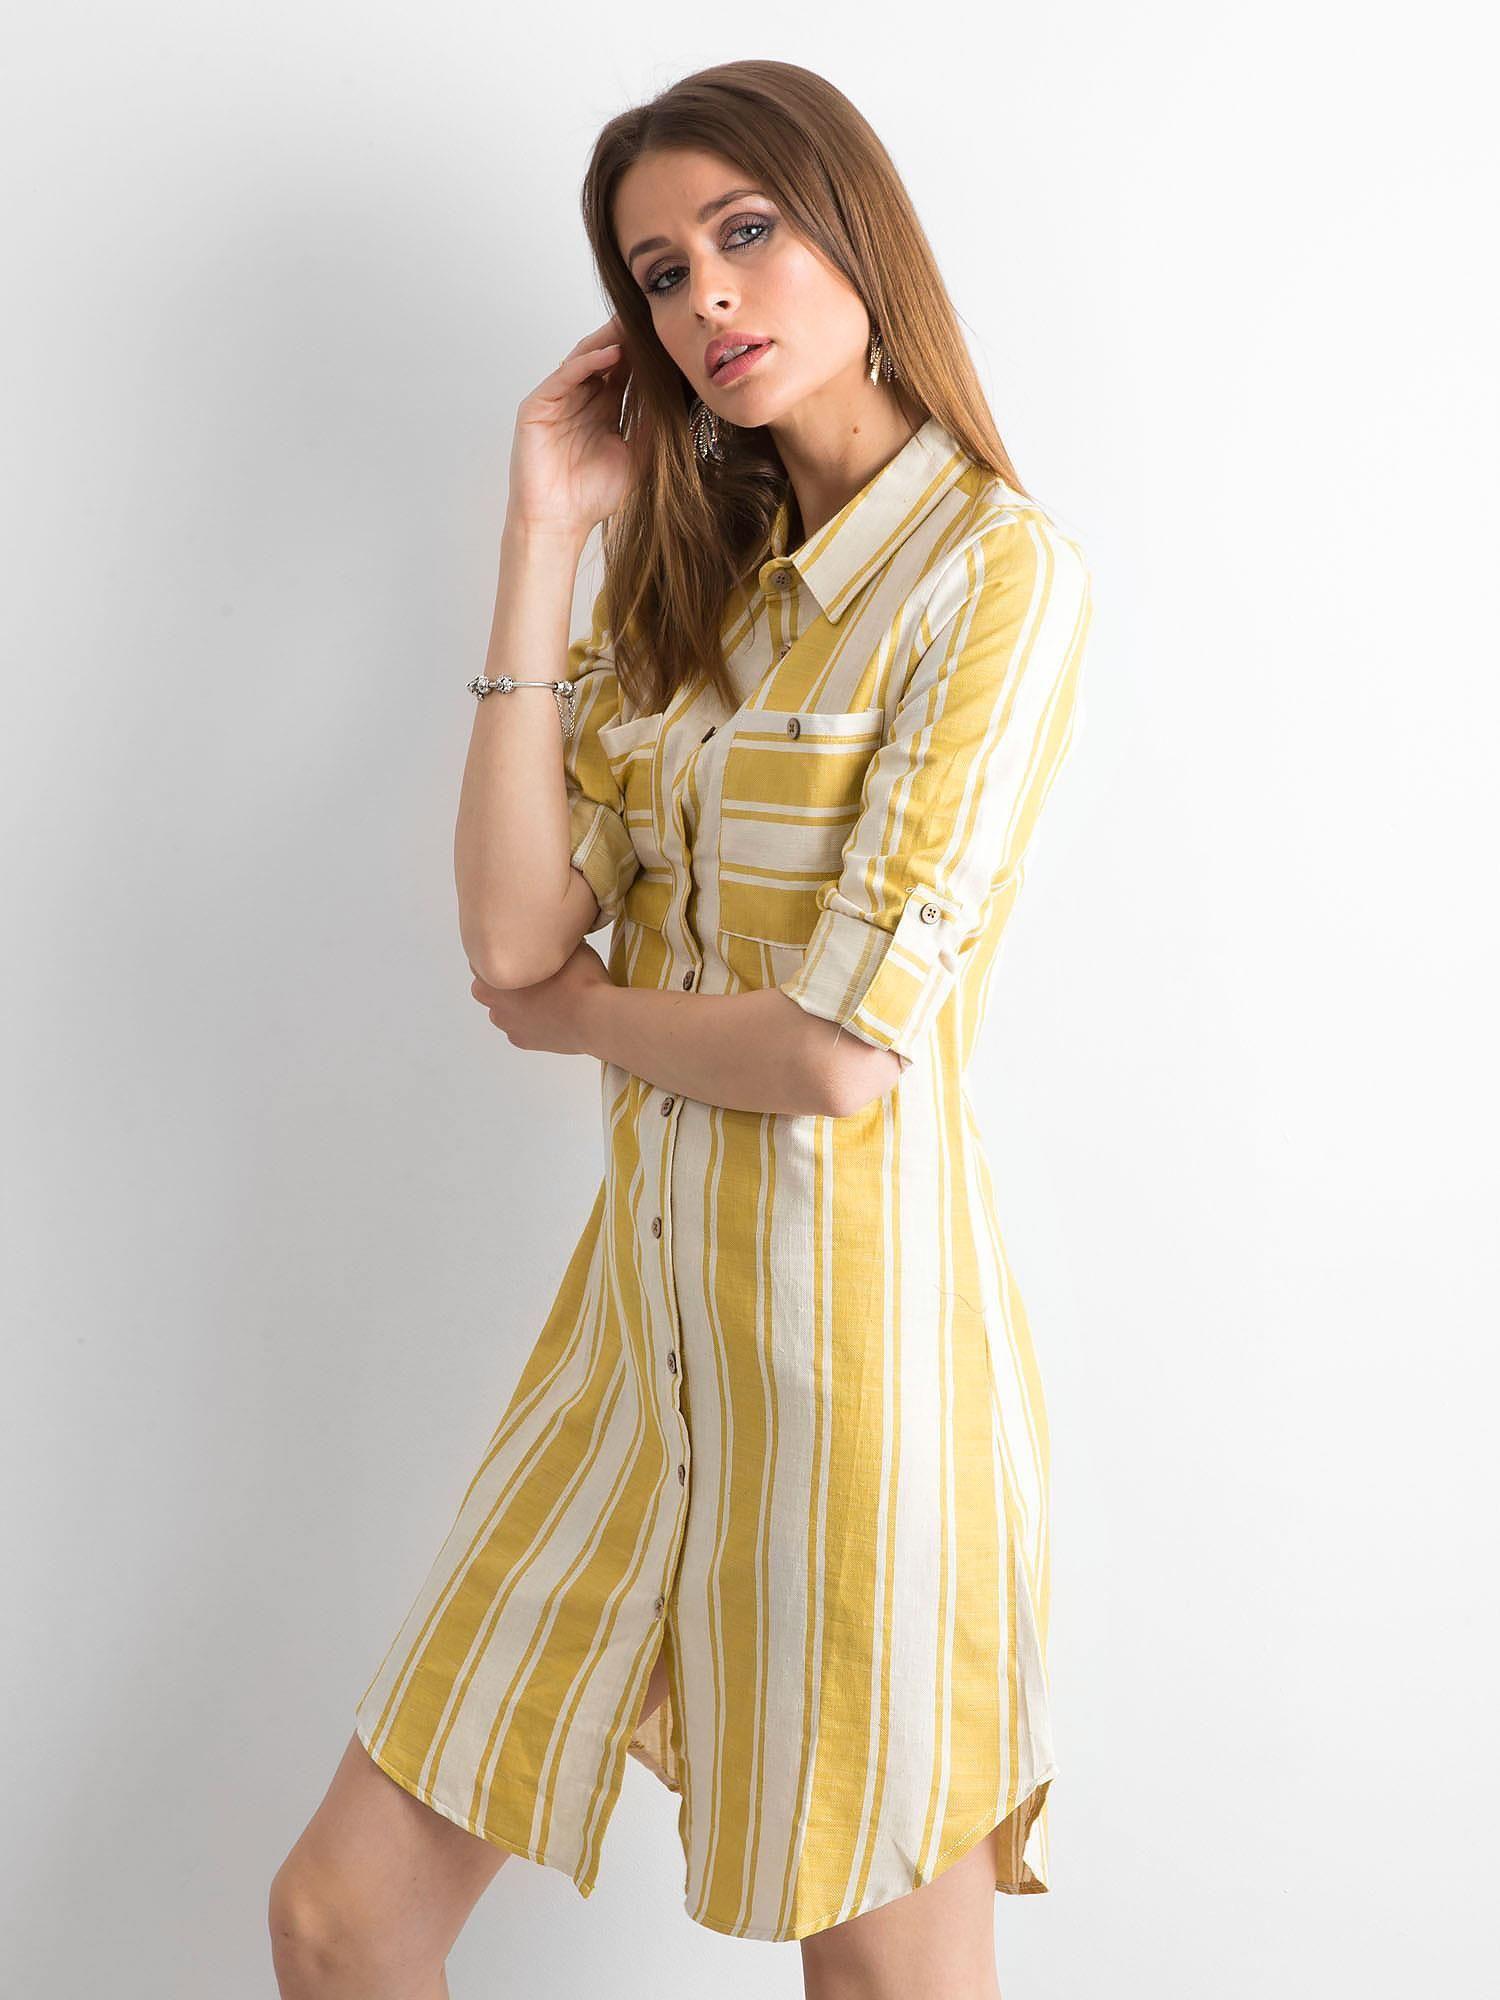 bc6a8fe19a Żółta sukienka szmizjerka w paski - Sukienka szmizjerka - sklep eButik.pl